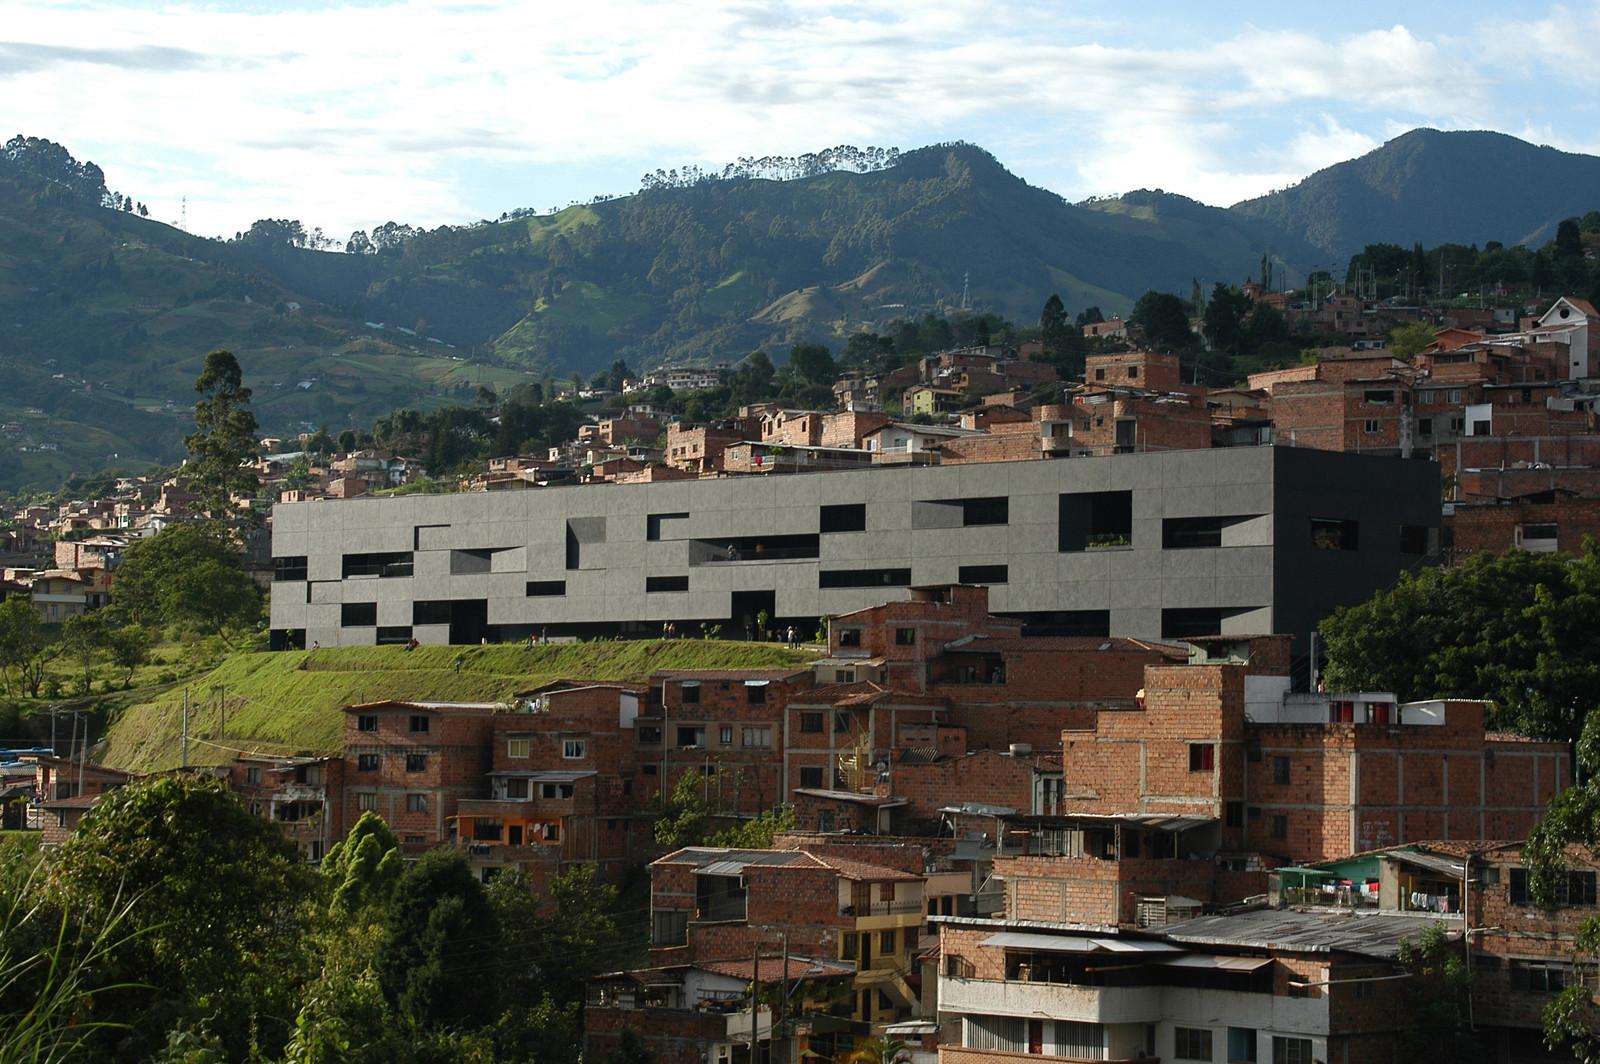 Fernando Botero Park Library / G Ateliers Architecture, © Orlando Garcia